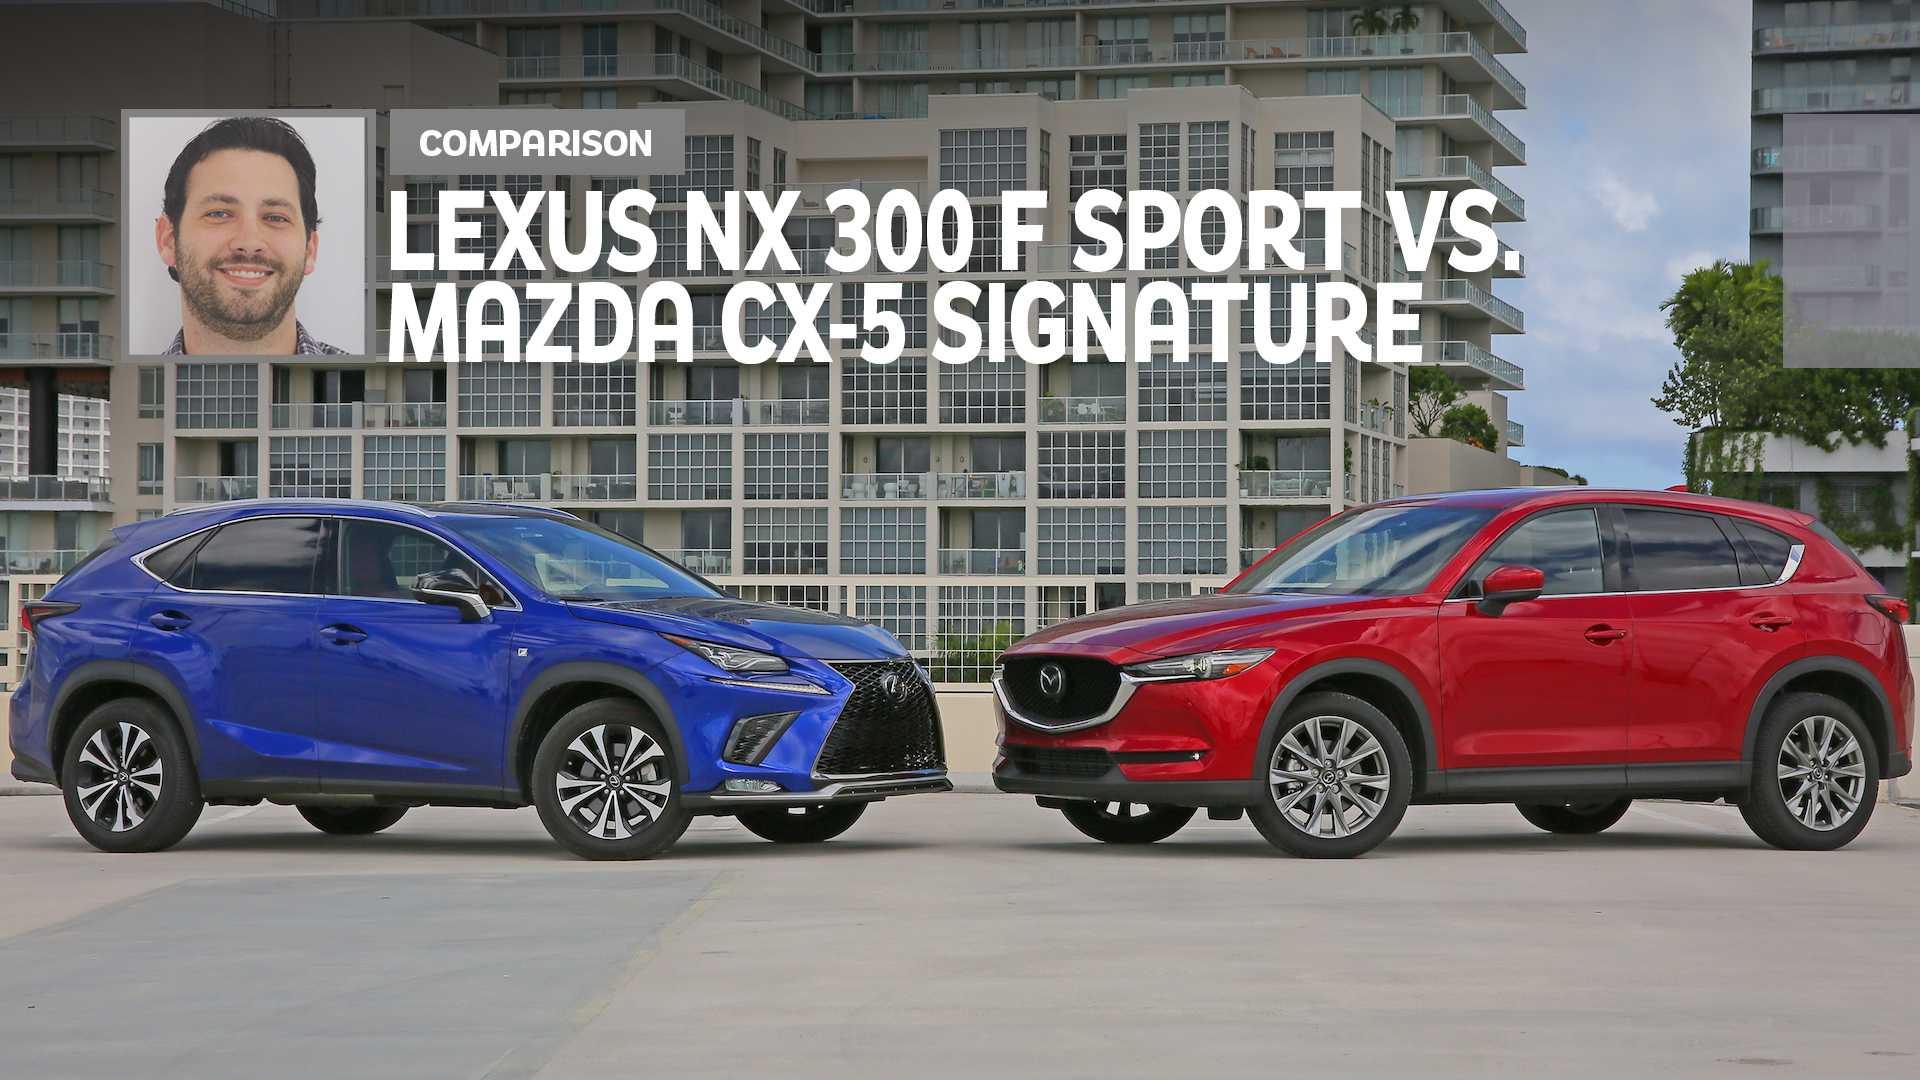 2019 Lexus NX 300 Vs. 2019 Mazda CX-5 Comparison: Nexus Of Luxury